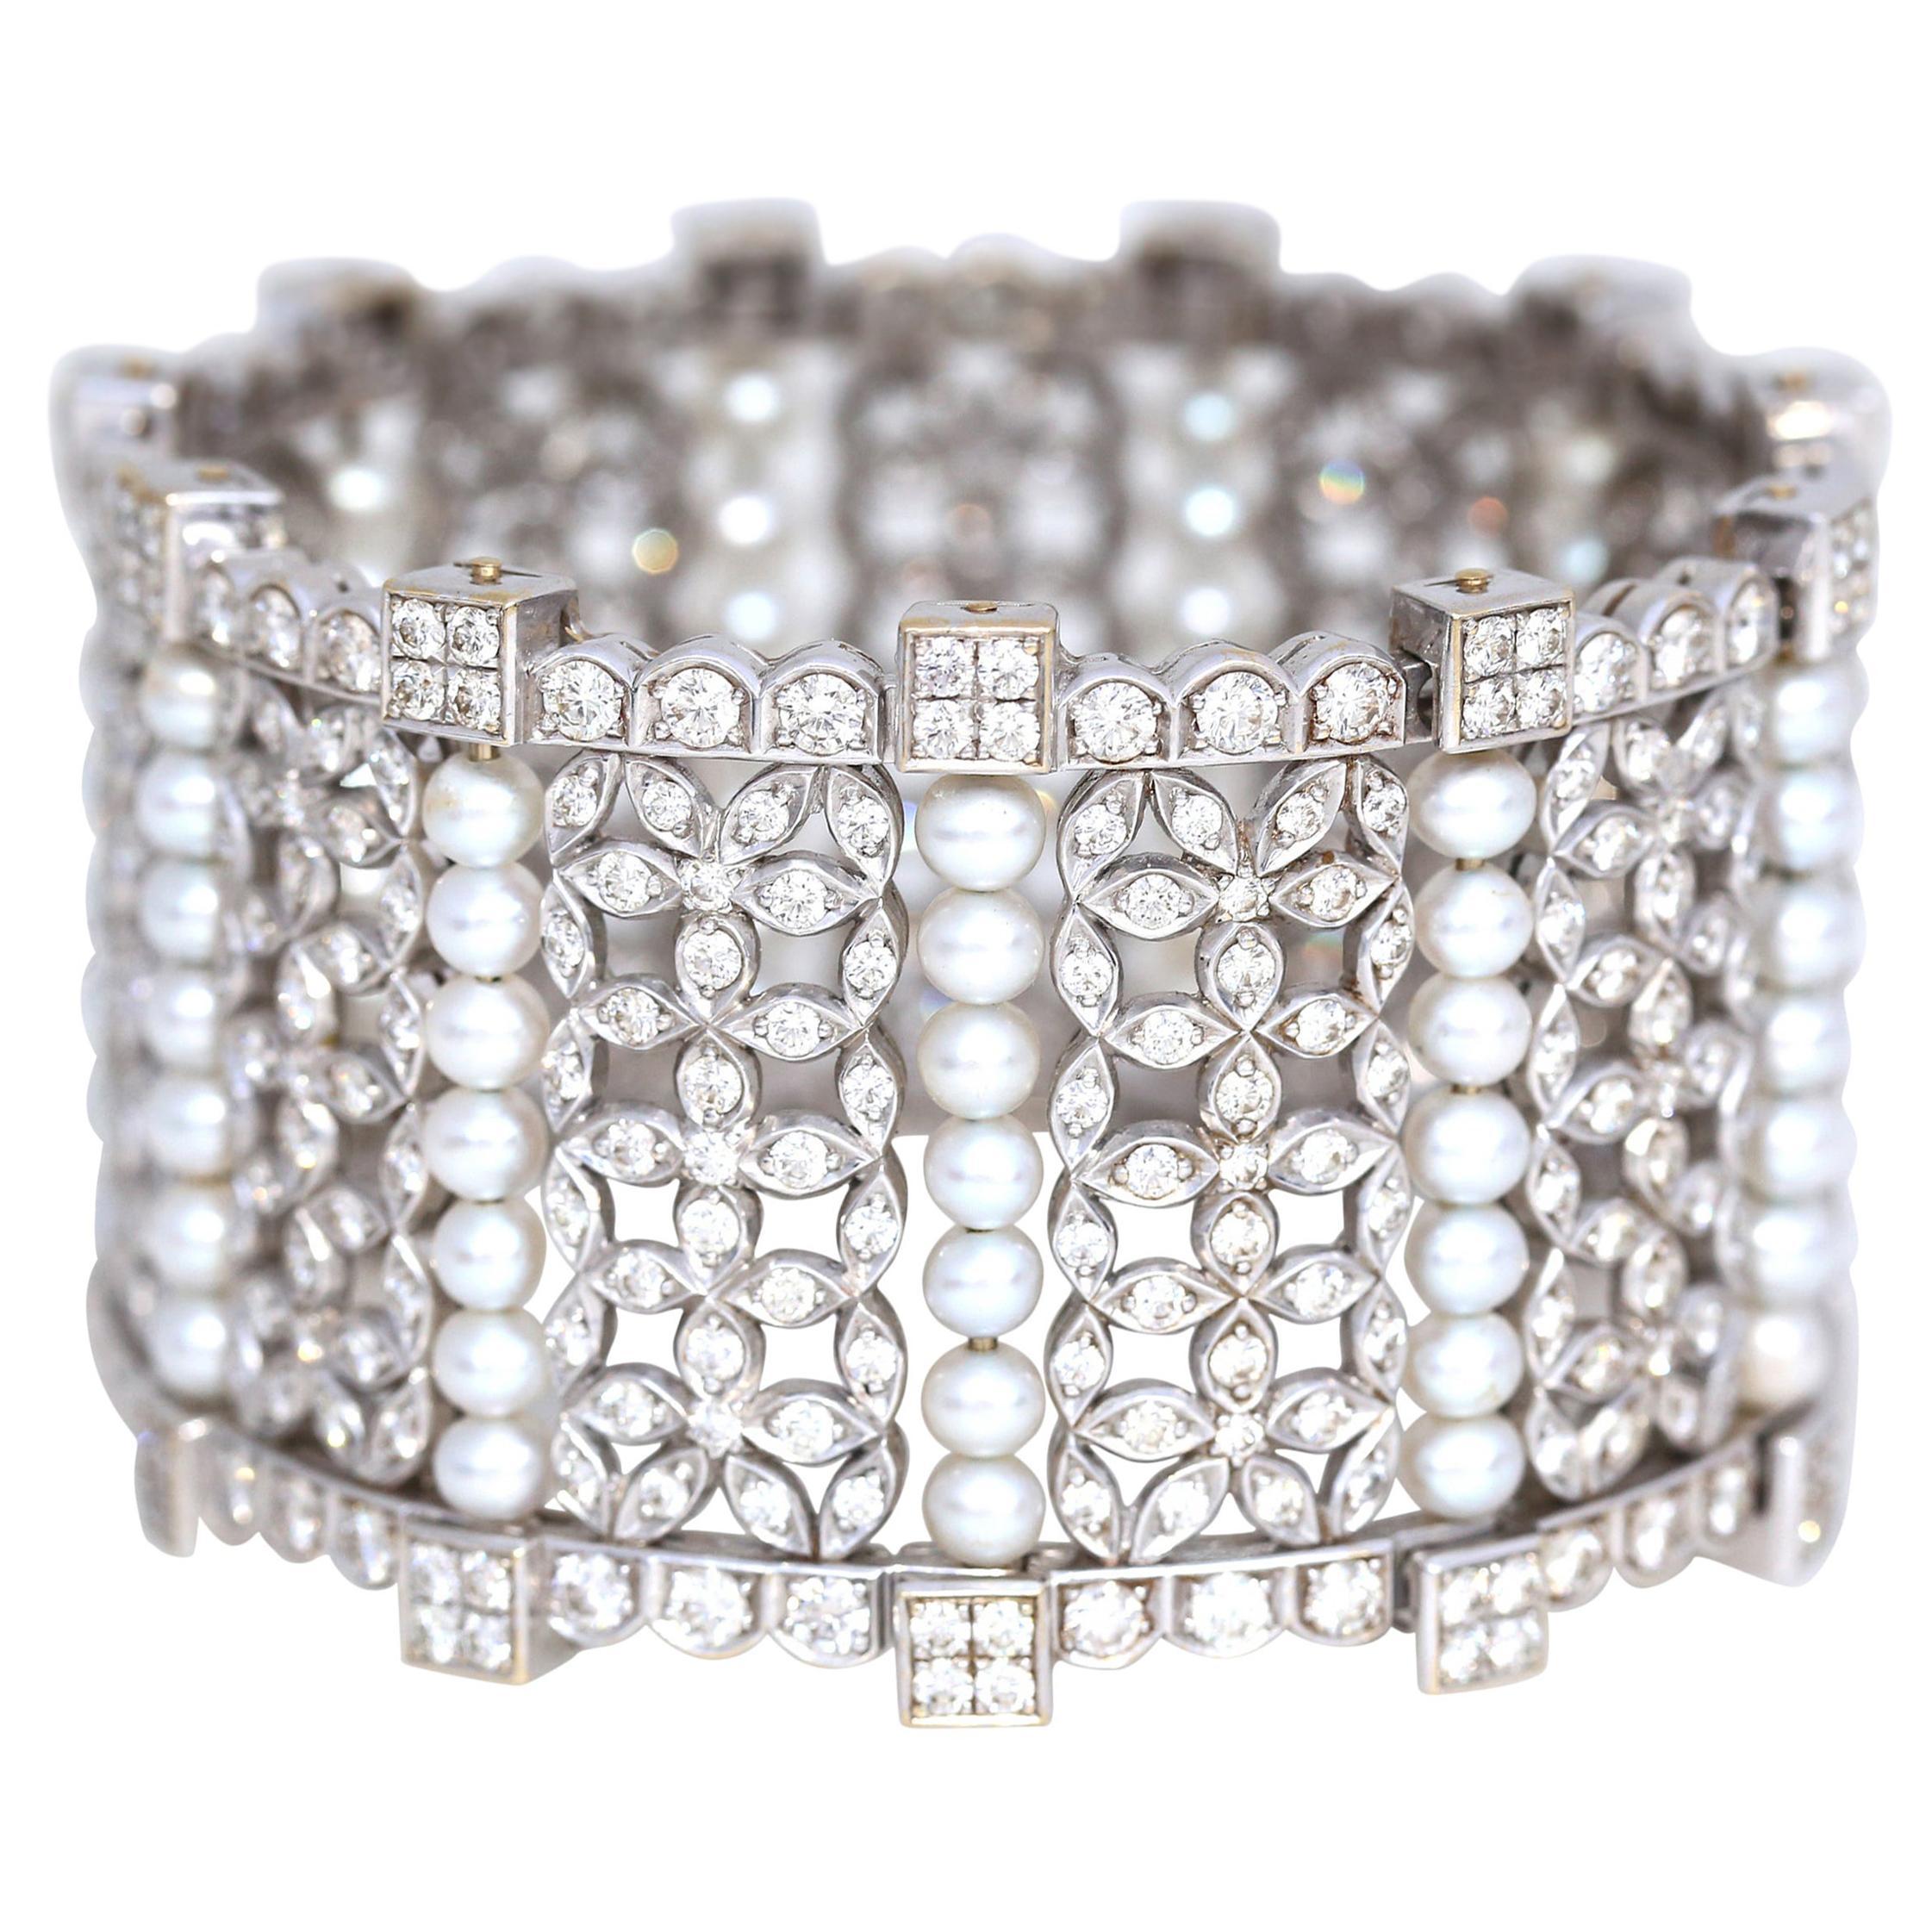 15 Carat Diamonds Pearls White Gold Bangle Bracelet, 1999